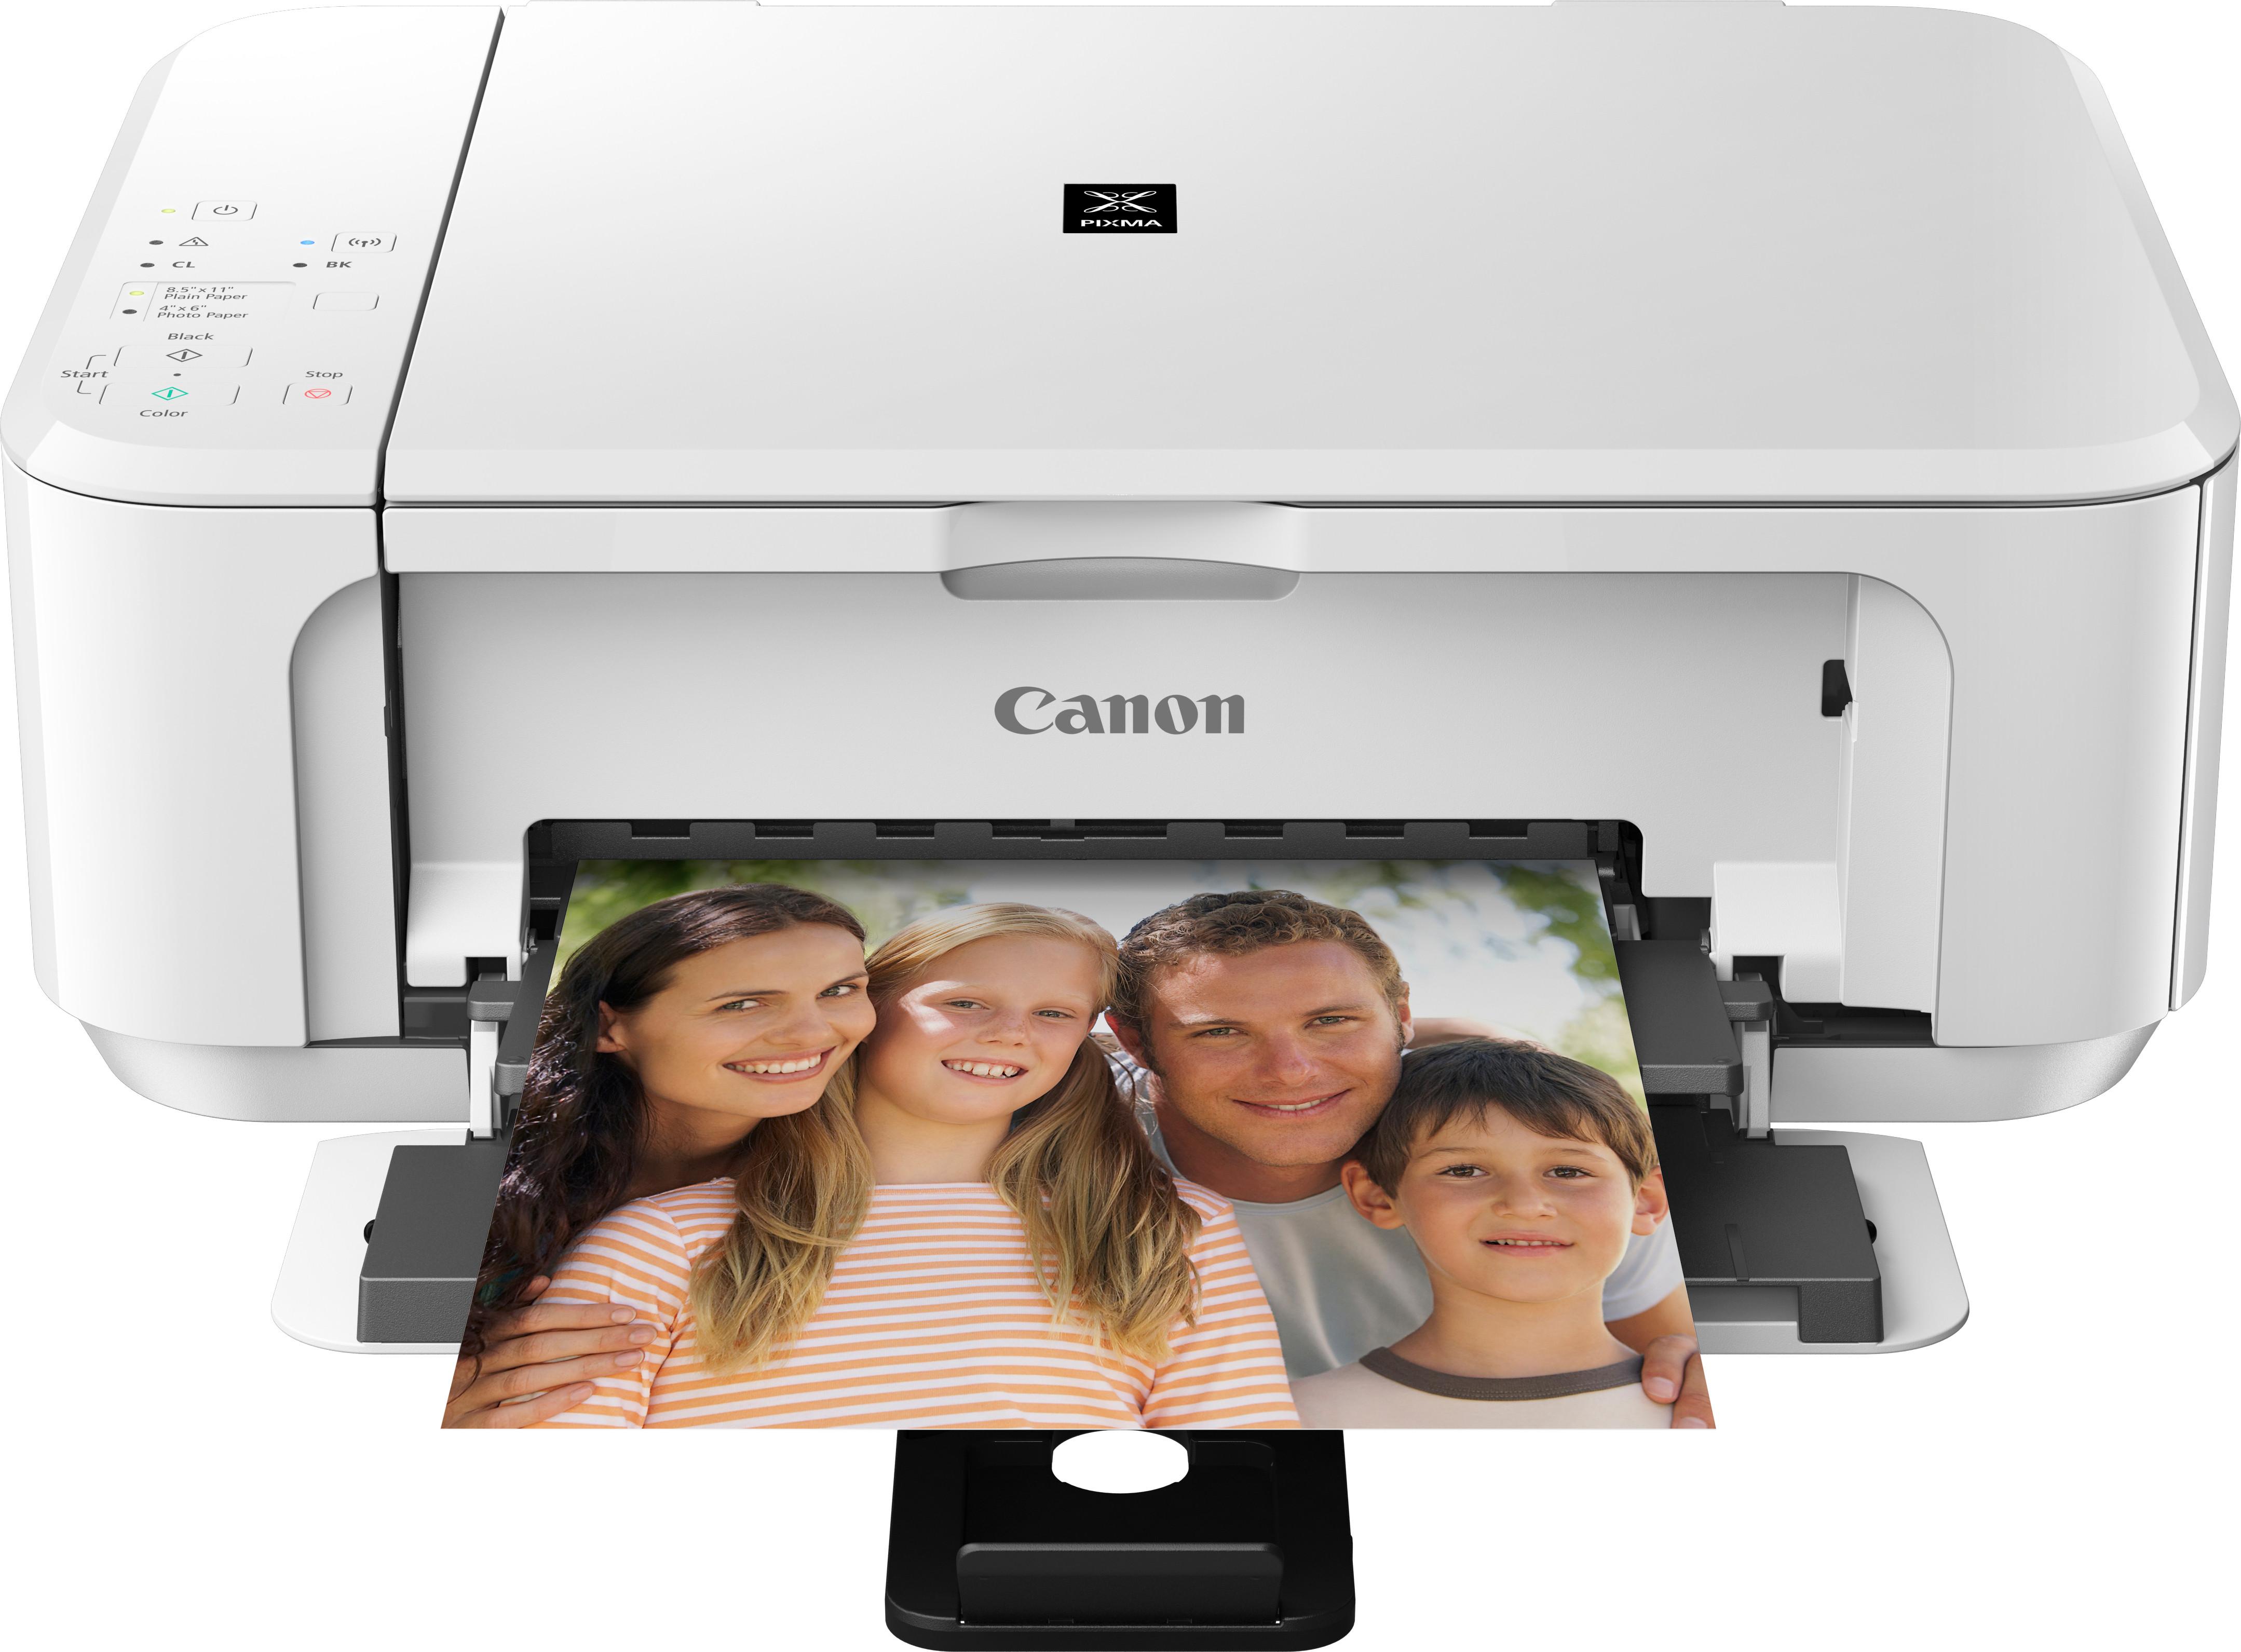 Canon PowerShot A640 10.0MP Digital Camera Black